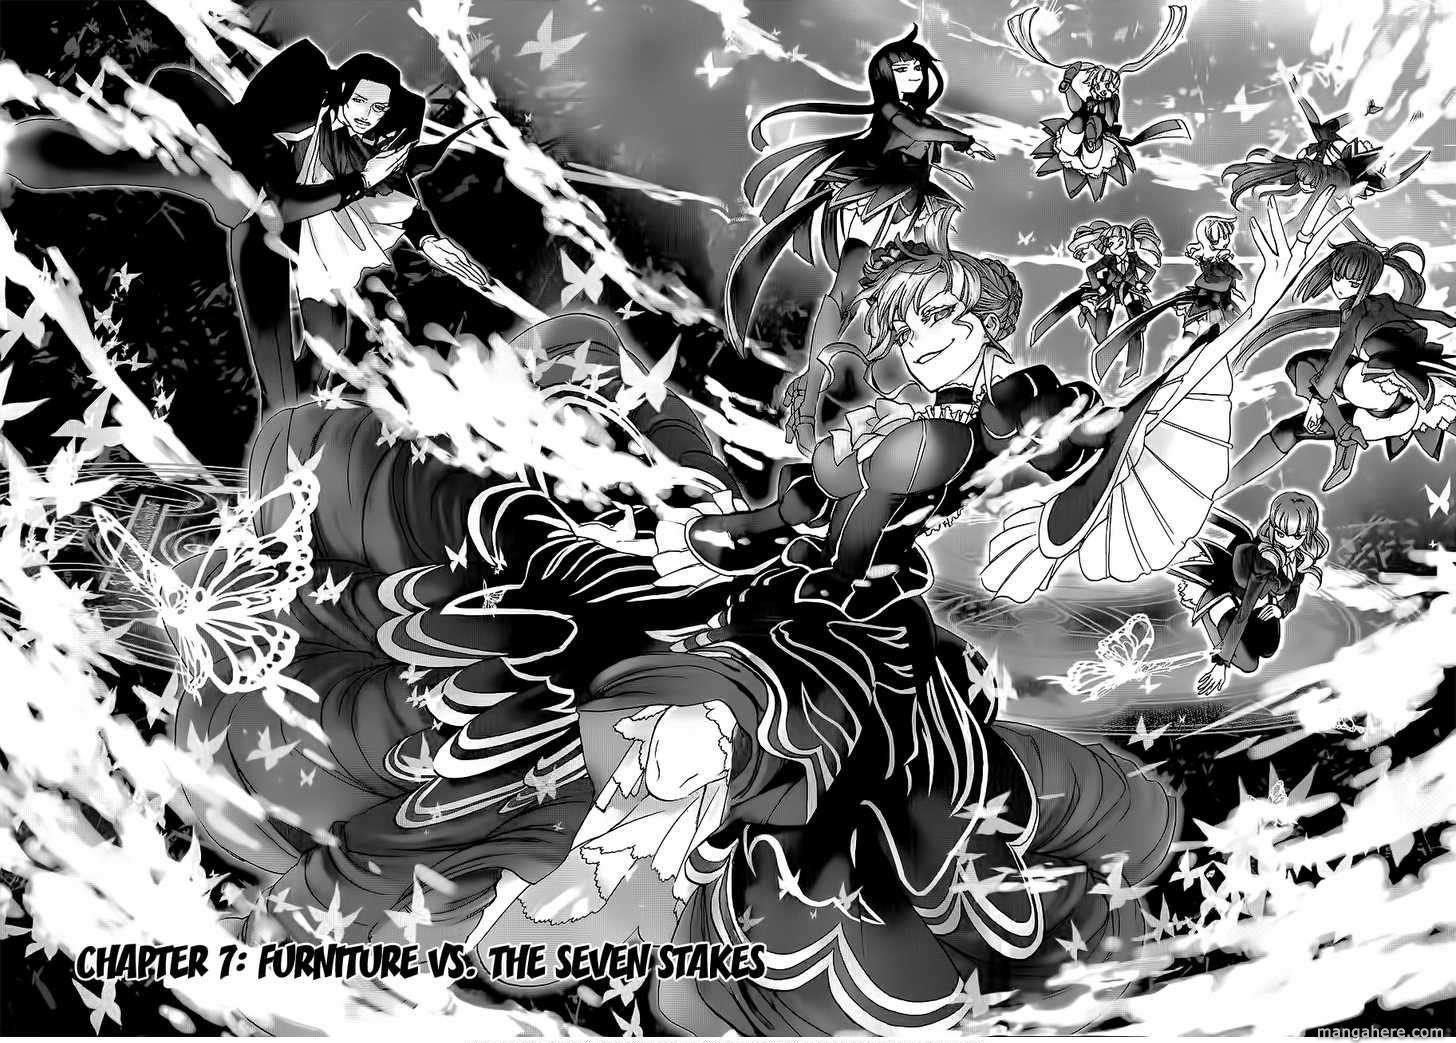 Umineko no Naku Koro ni Episode 3: Banquet of the Golden Witch 7 Page 2